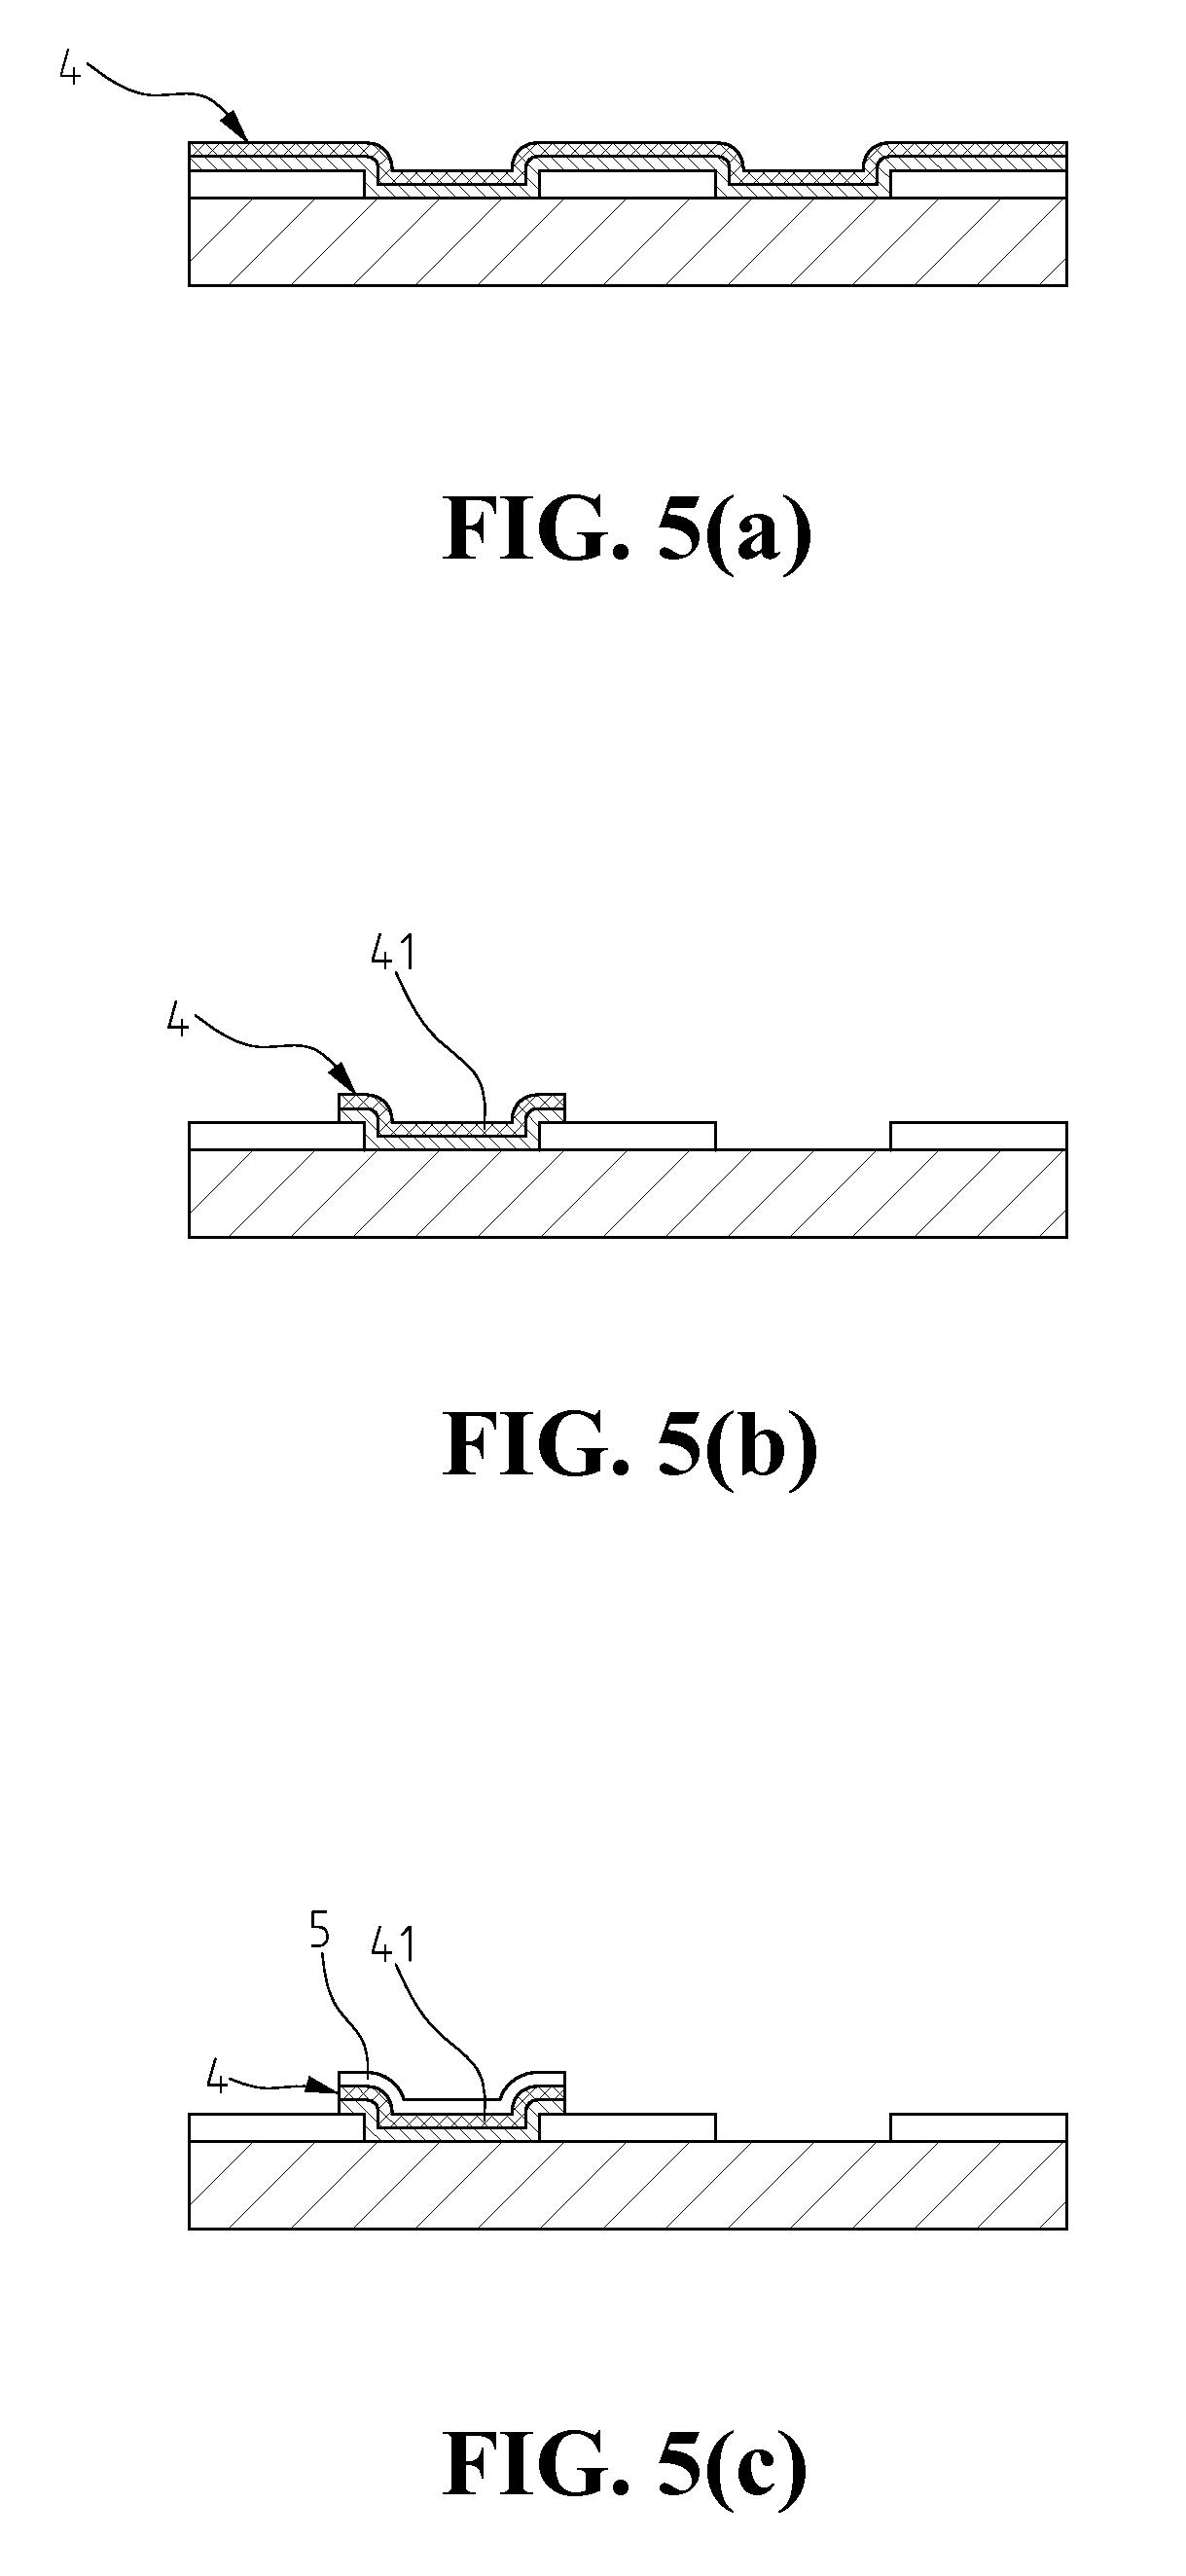 Thin Film Resistors Circuit Board Best Secret Wiring Diagram Patent Us20070124918 Method For Fabricating Embedded Lab 12v To 6v Resistor